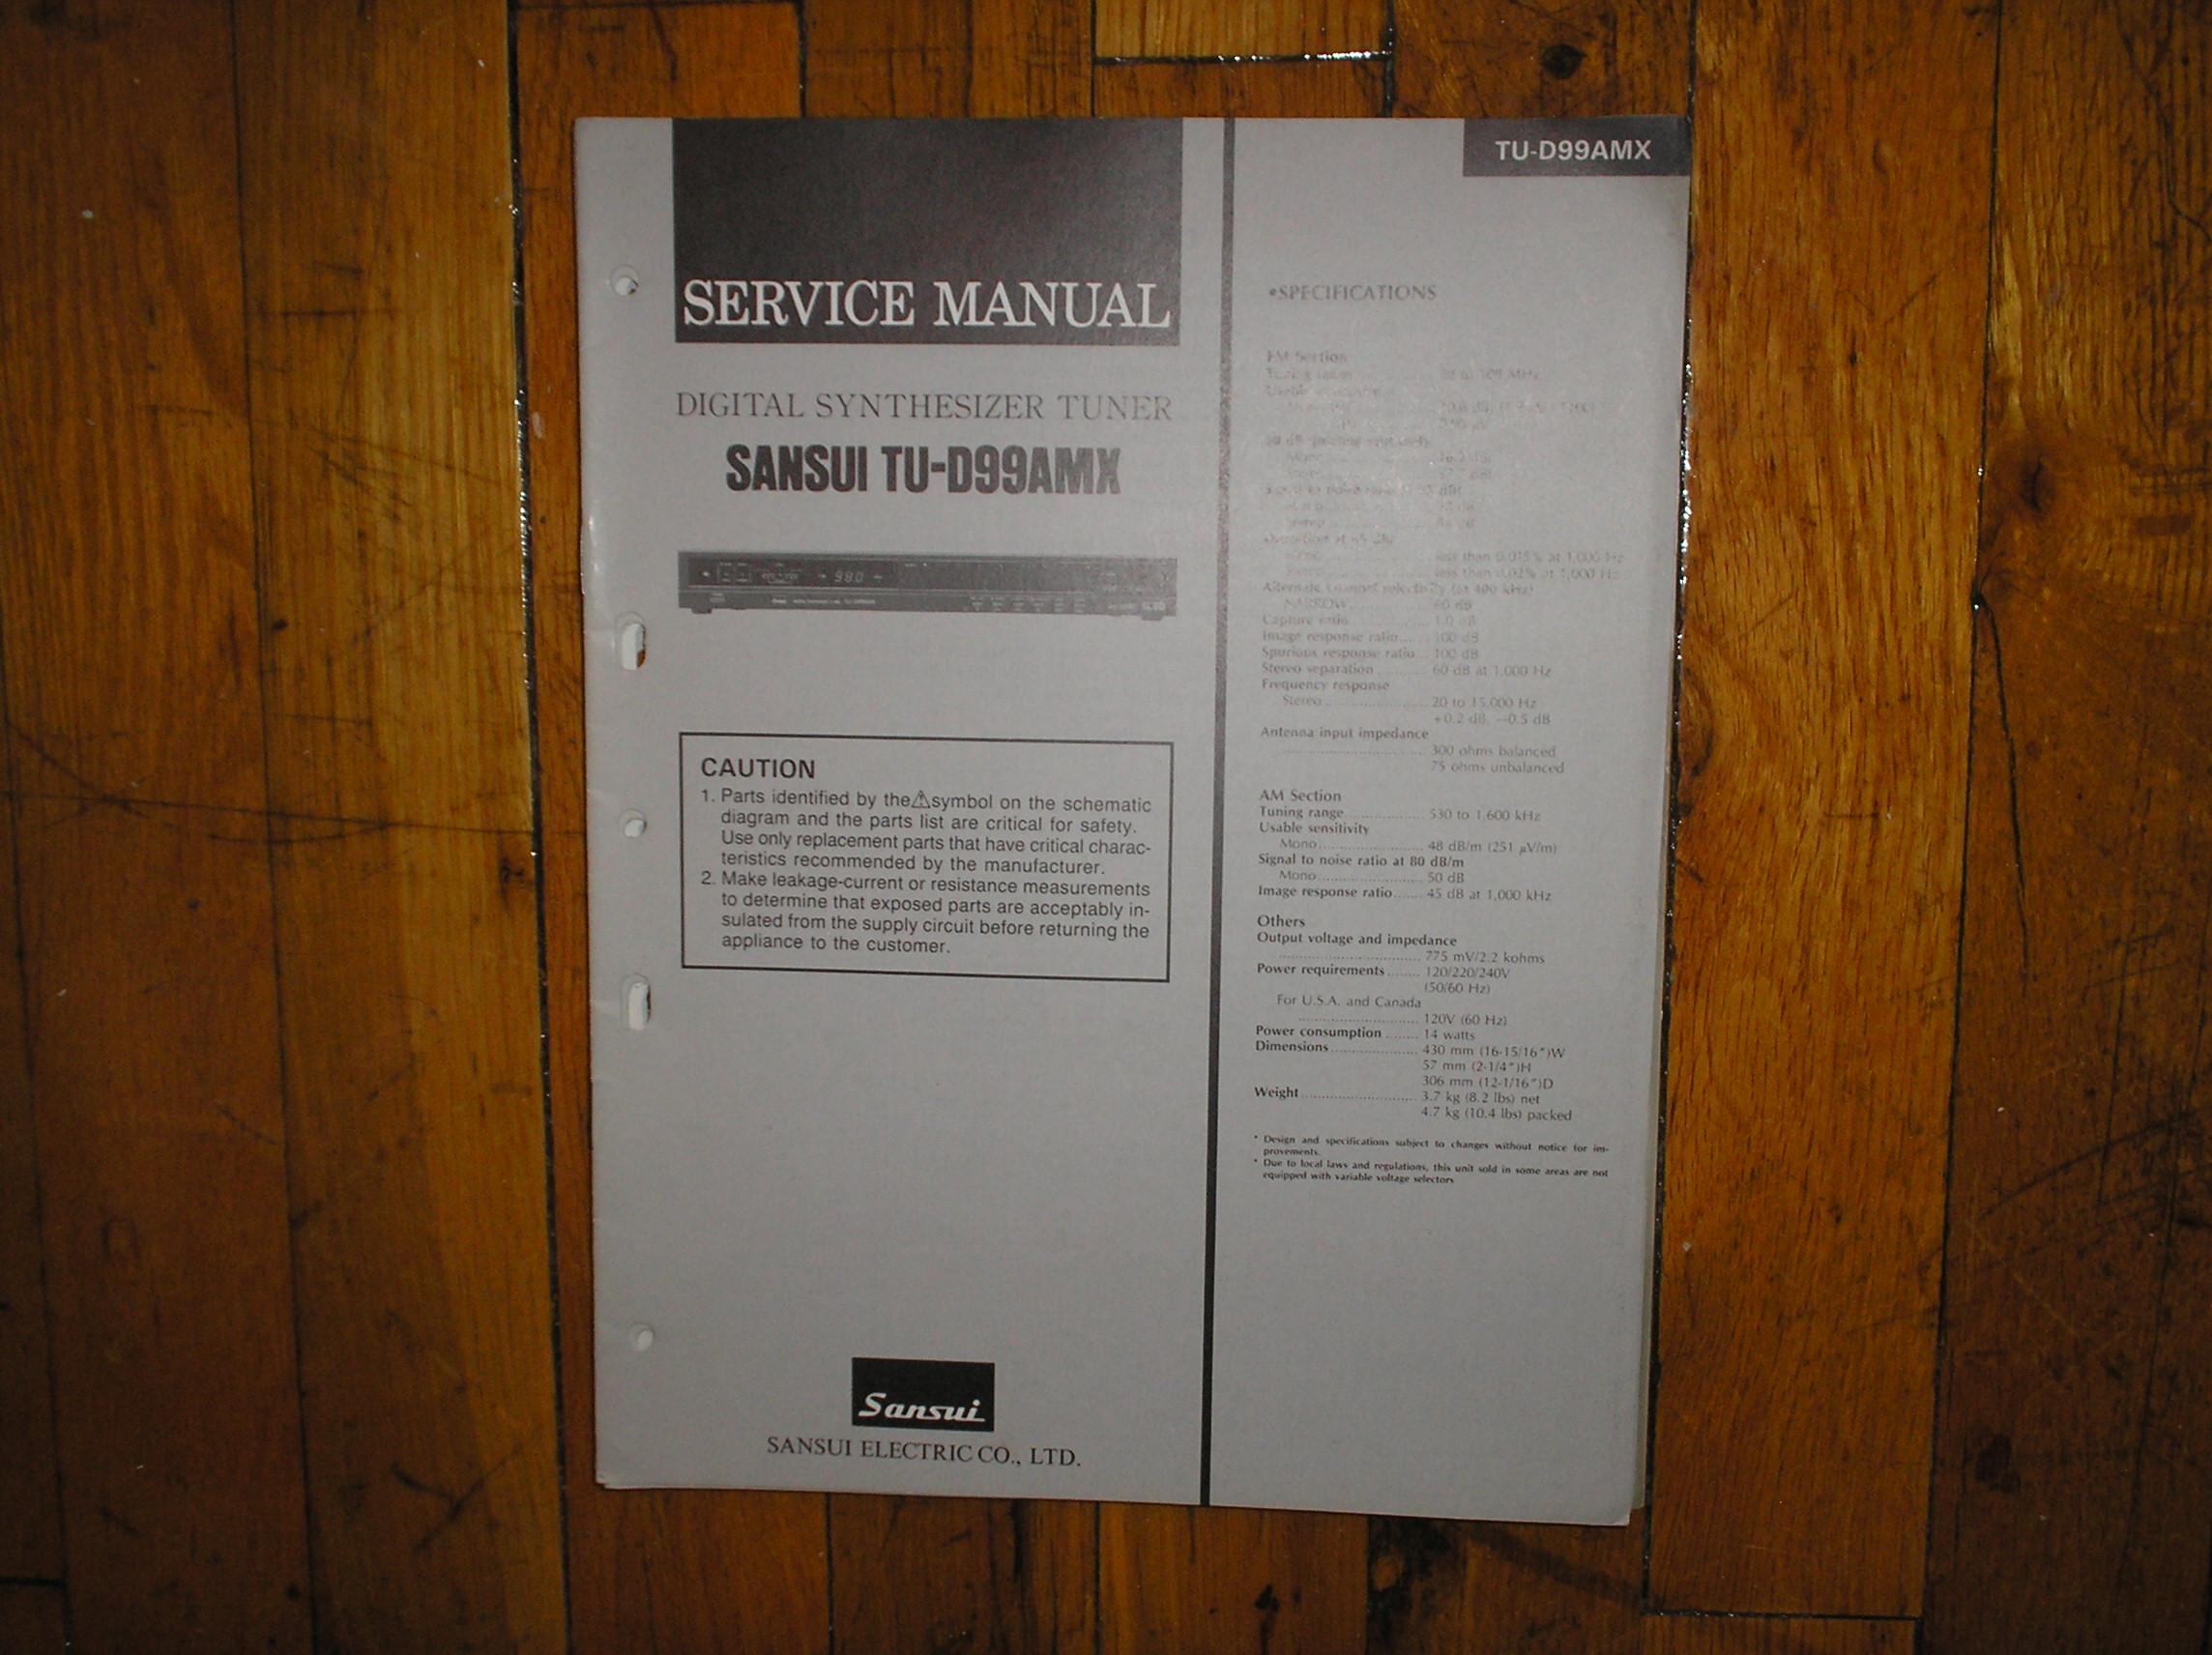 TU-D99AMX Tuner Service Manual